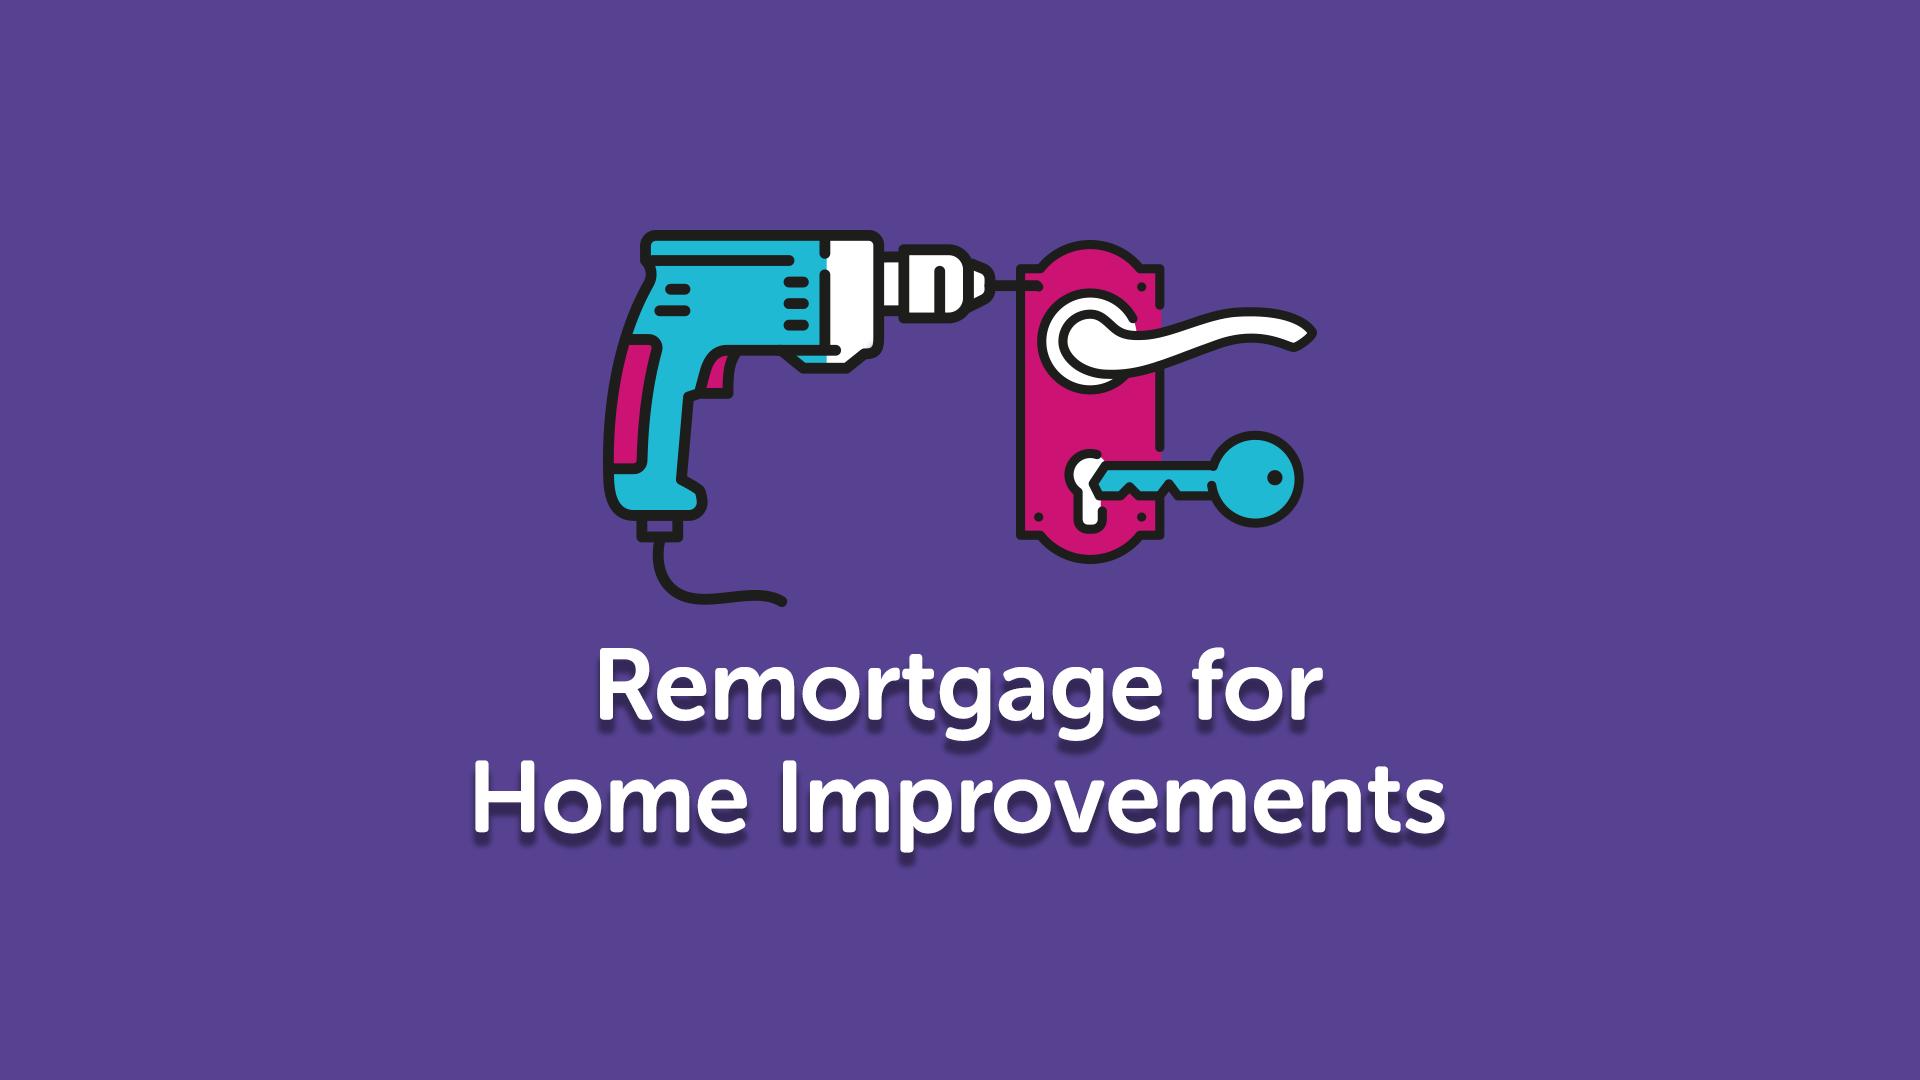 Remortgaging for Home Improvements | UK moneyman